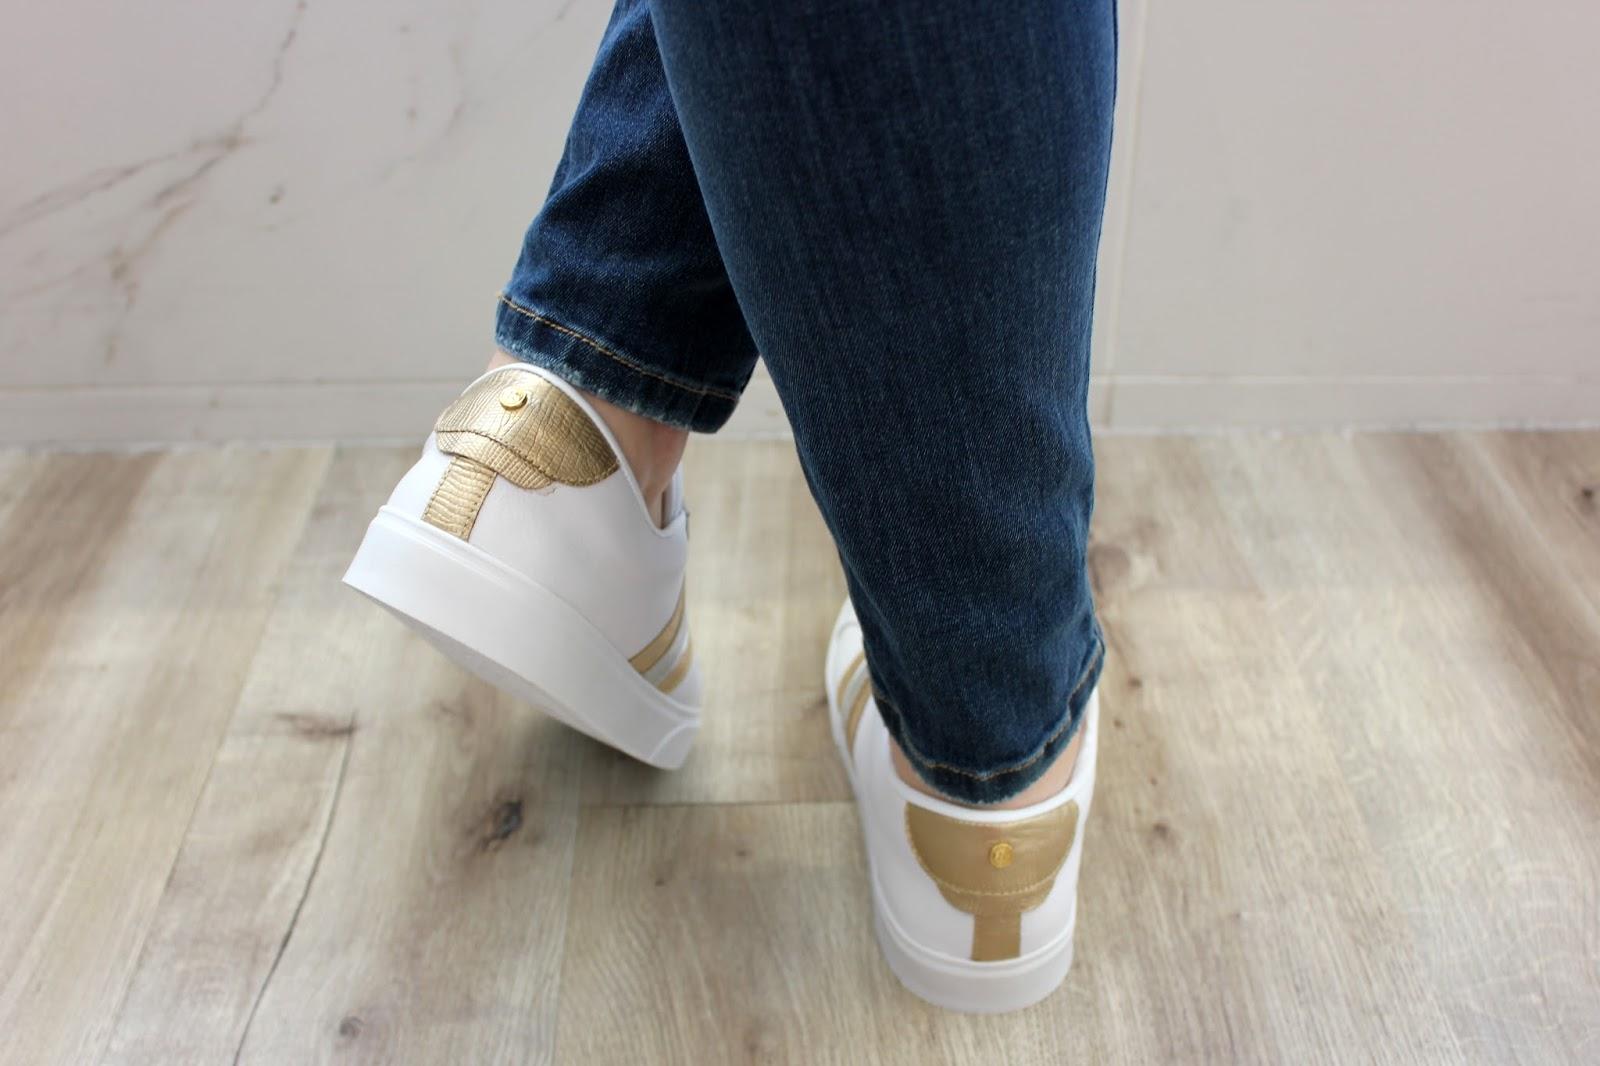 705234e74c33 Style Element  Kaanas  Tatacoa  Sneaker in White.